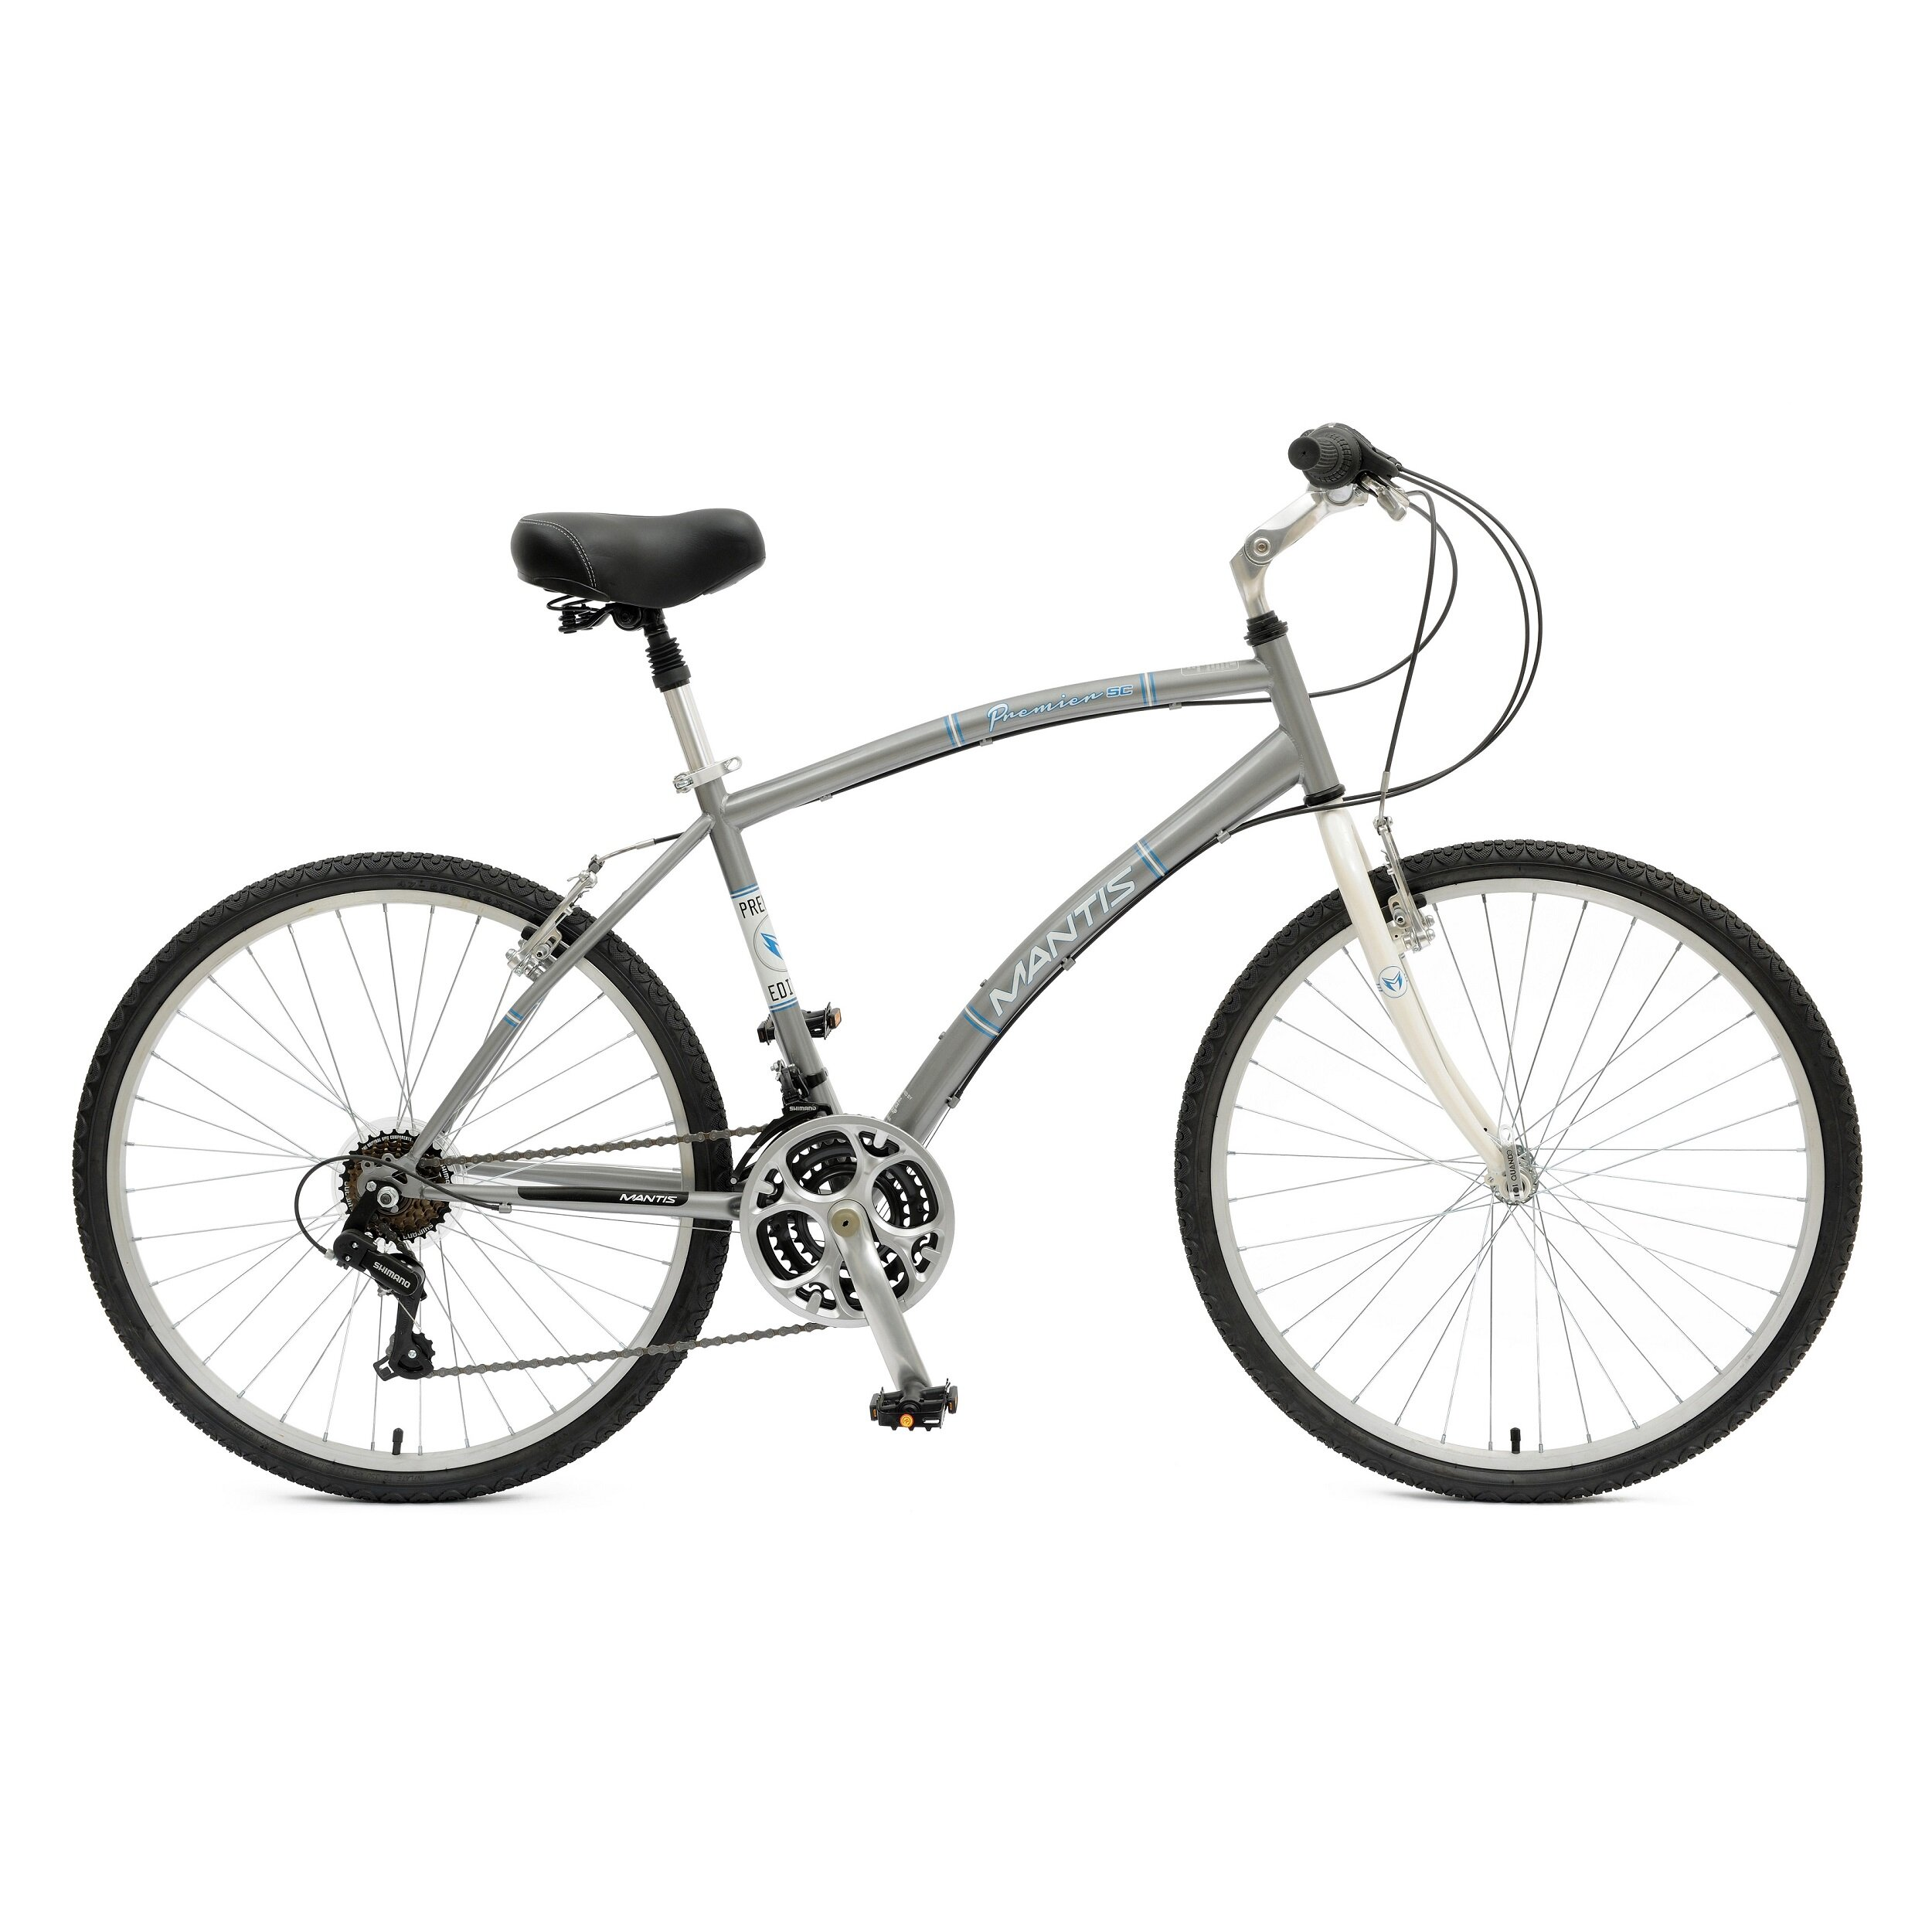 thecomfortbikeshopcom comfort bike reviews mens  html